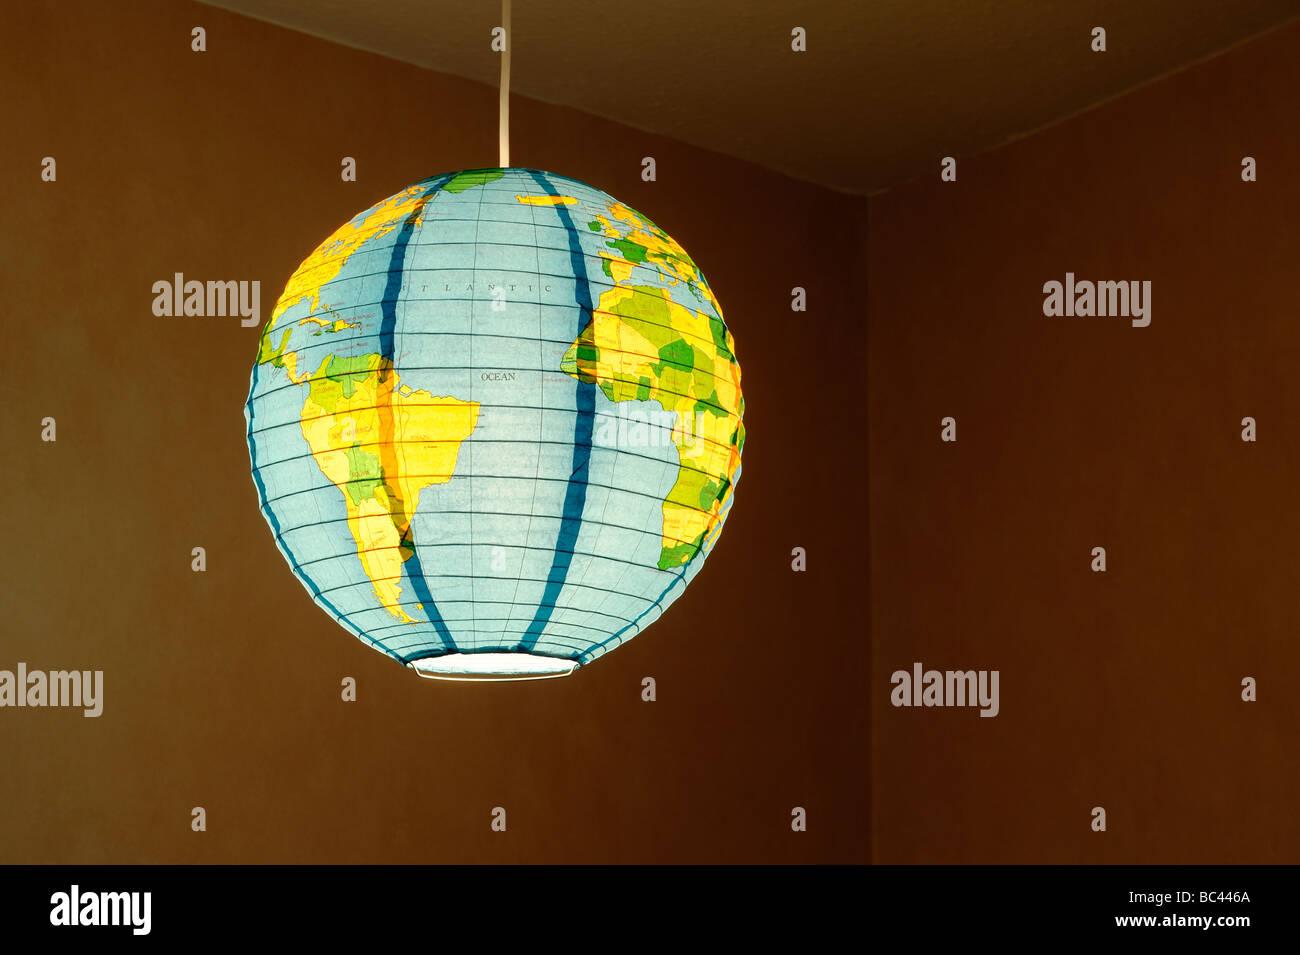 Lámpara de papel globo colgante sombra Imagen De Stock